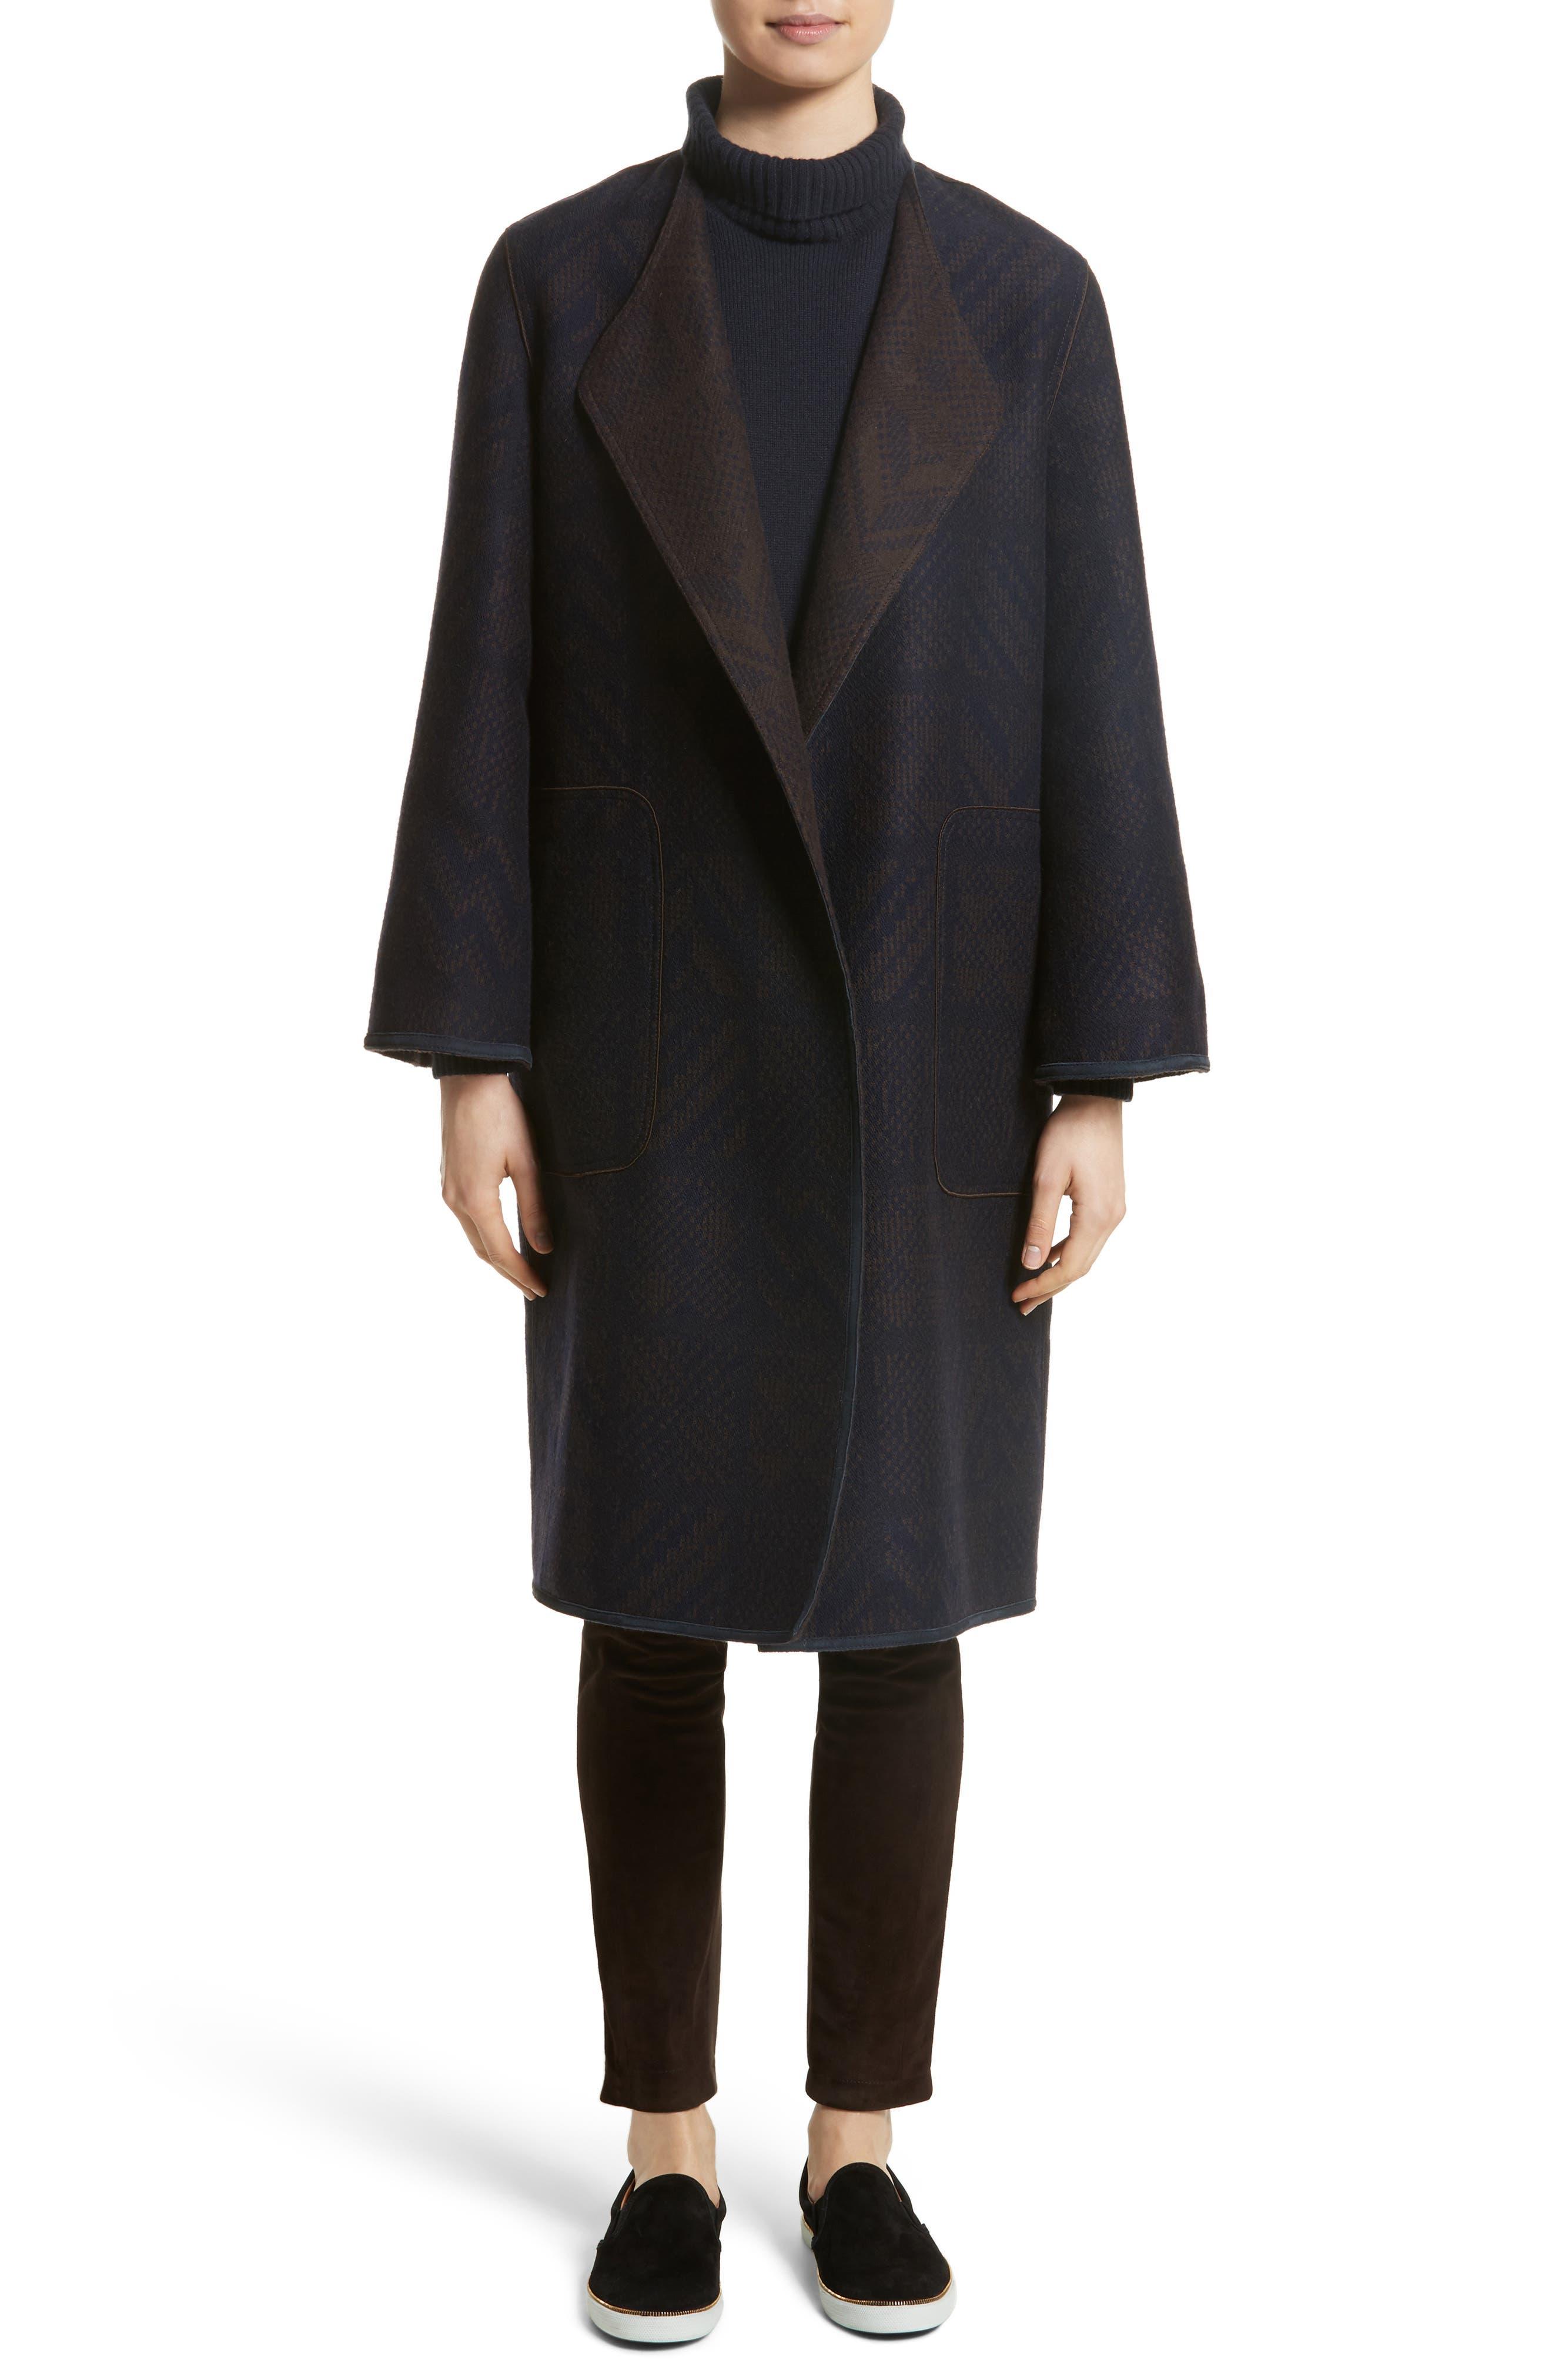 McCall Reversible Coat,                             Alternate thumbnail 8, color,                             438